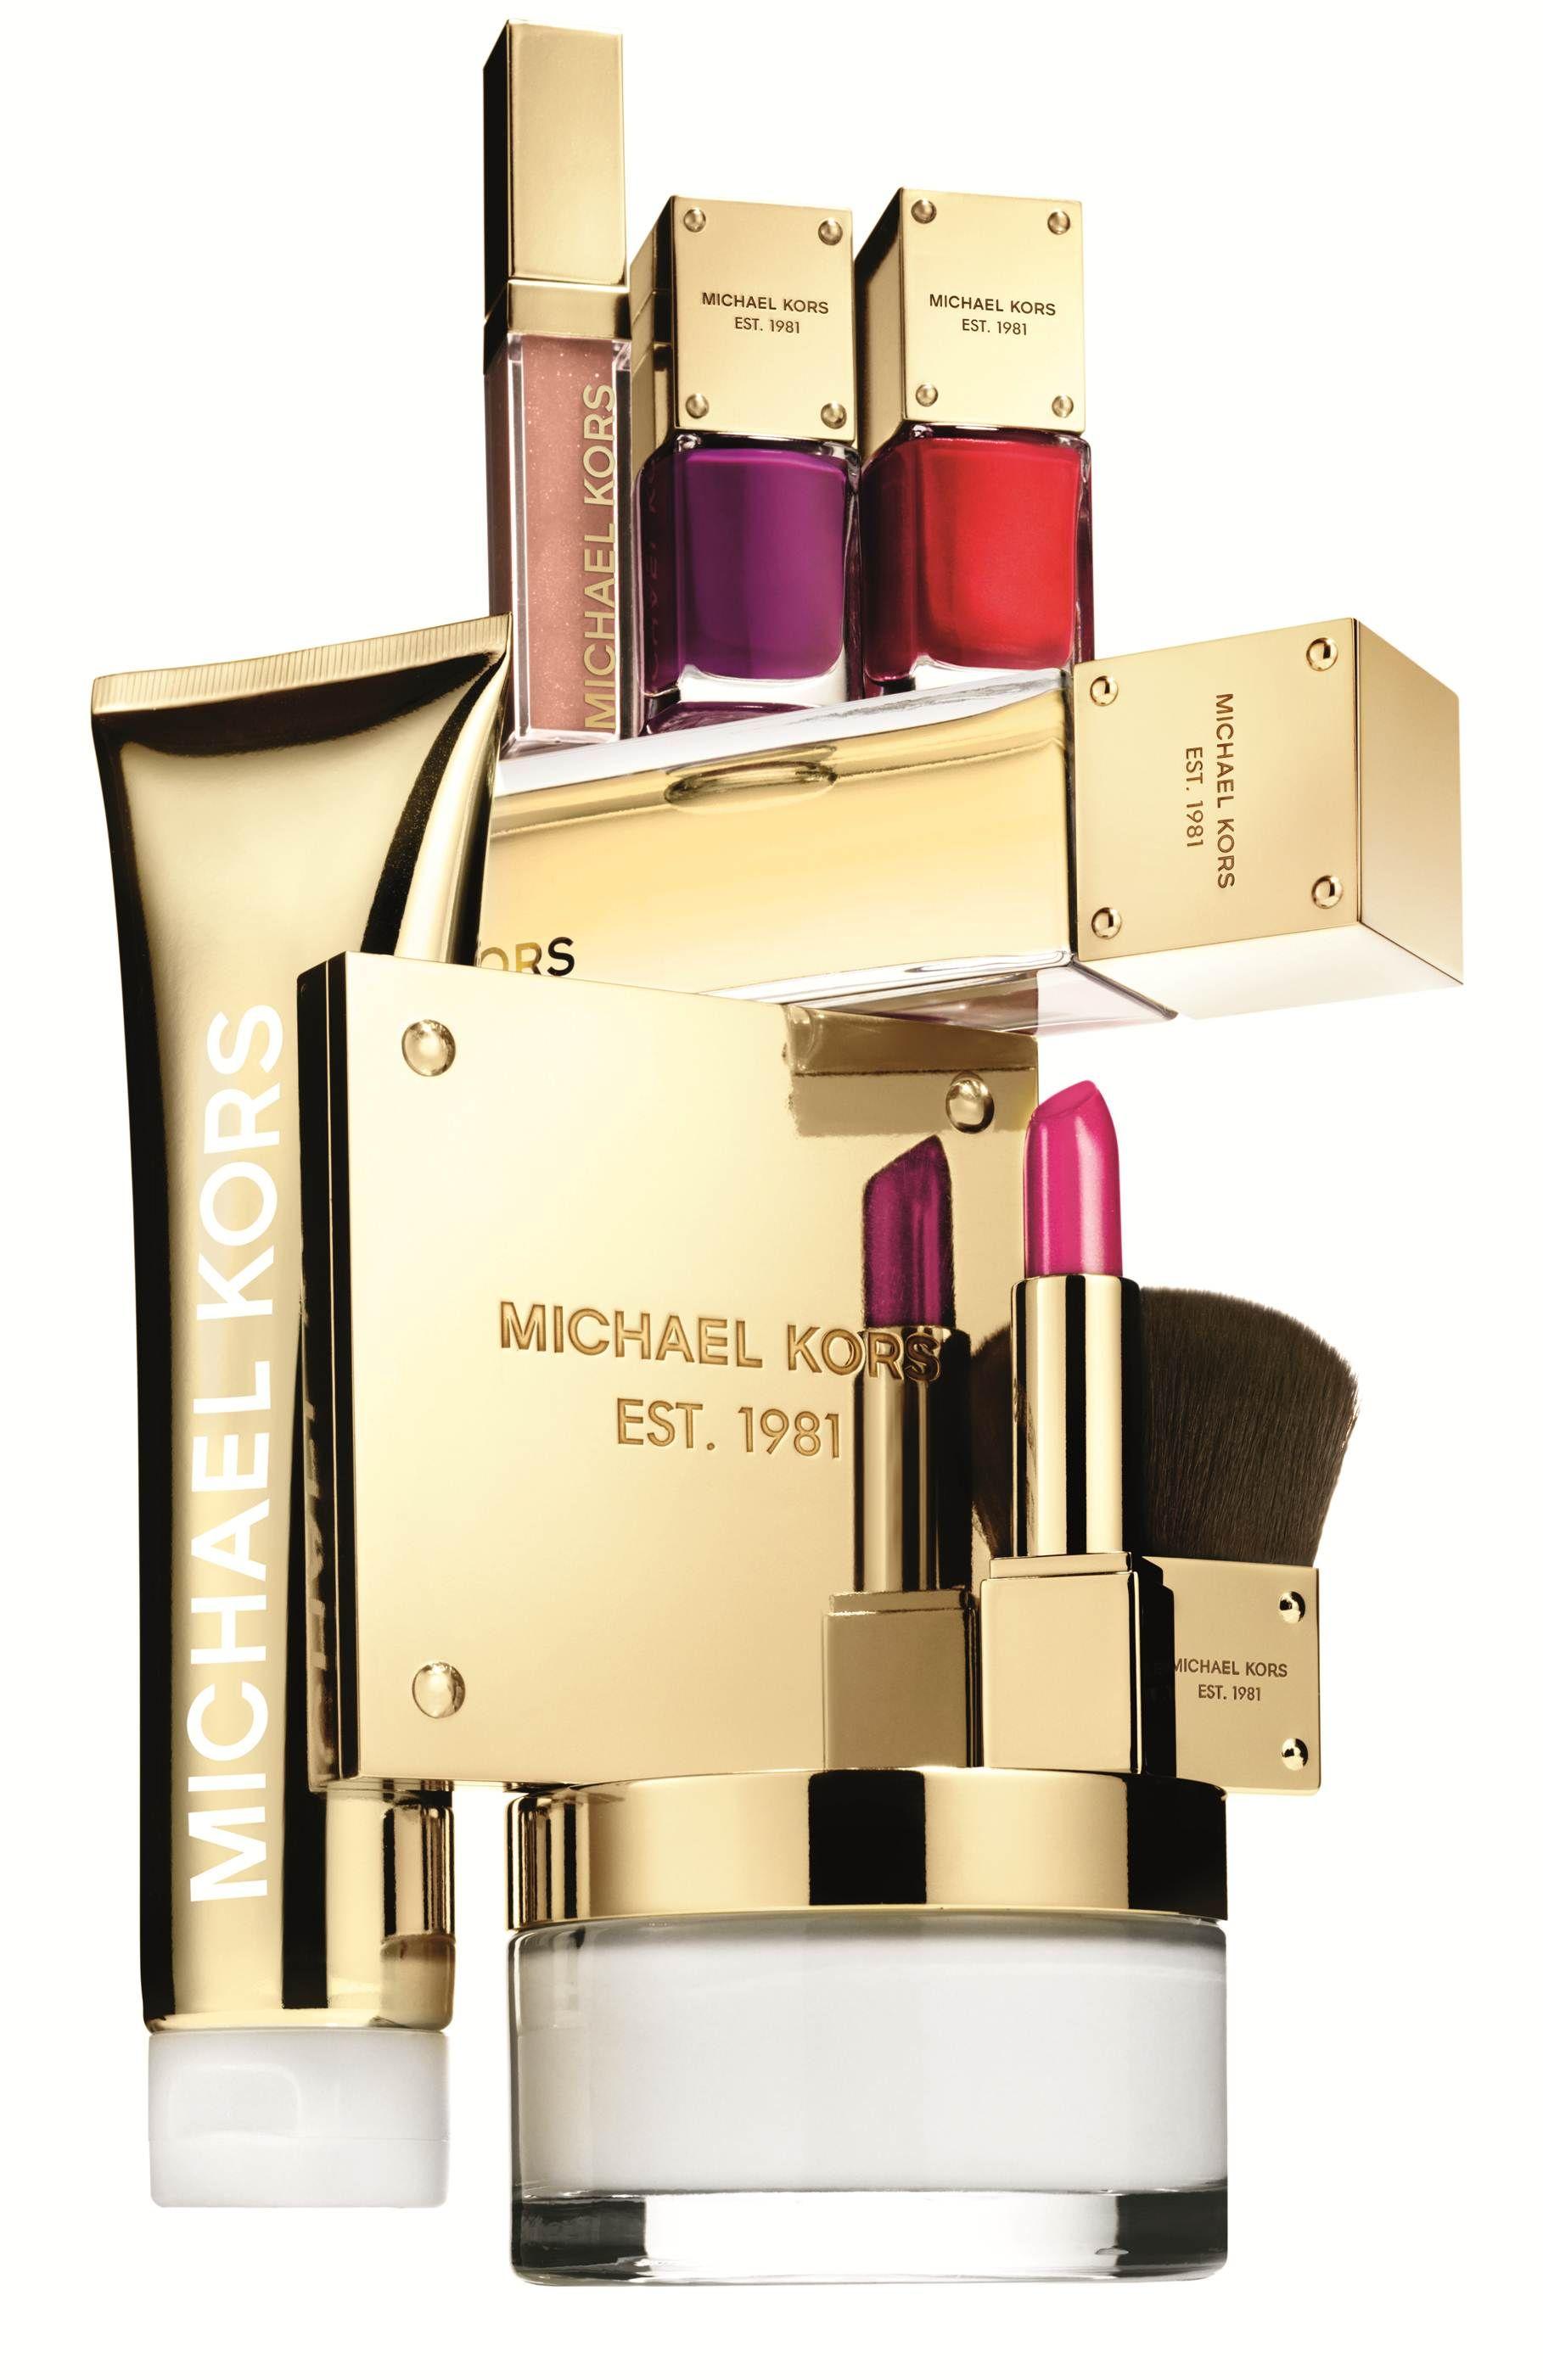 MK beauty collection #michaelkors #douglas